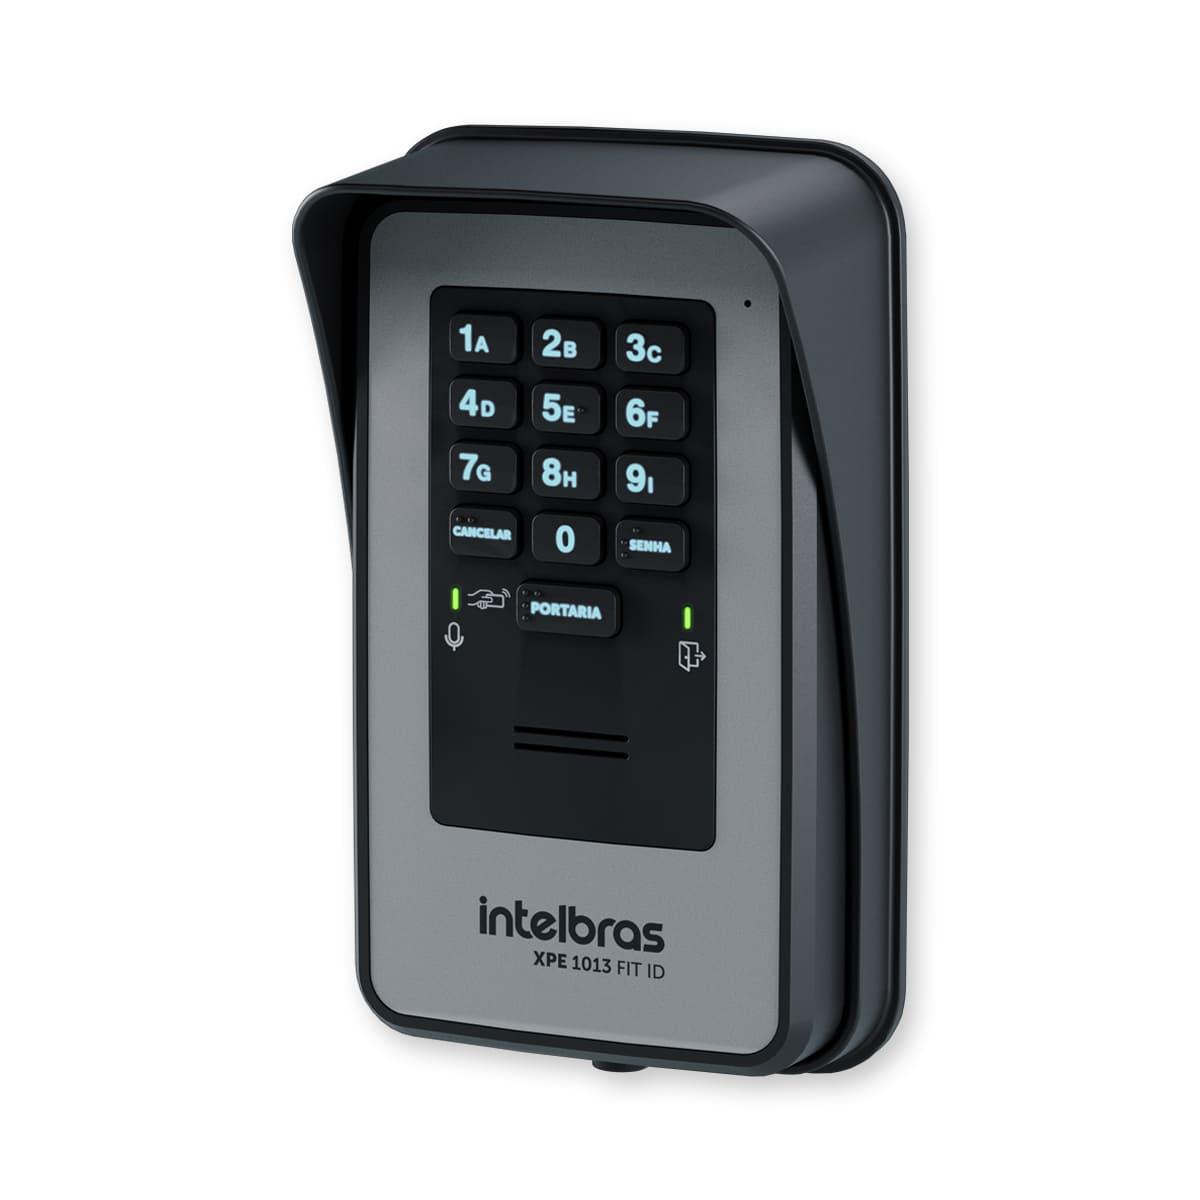 Porteiro Eletrônico Intelbras XPE 1013 FIT ID RFID